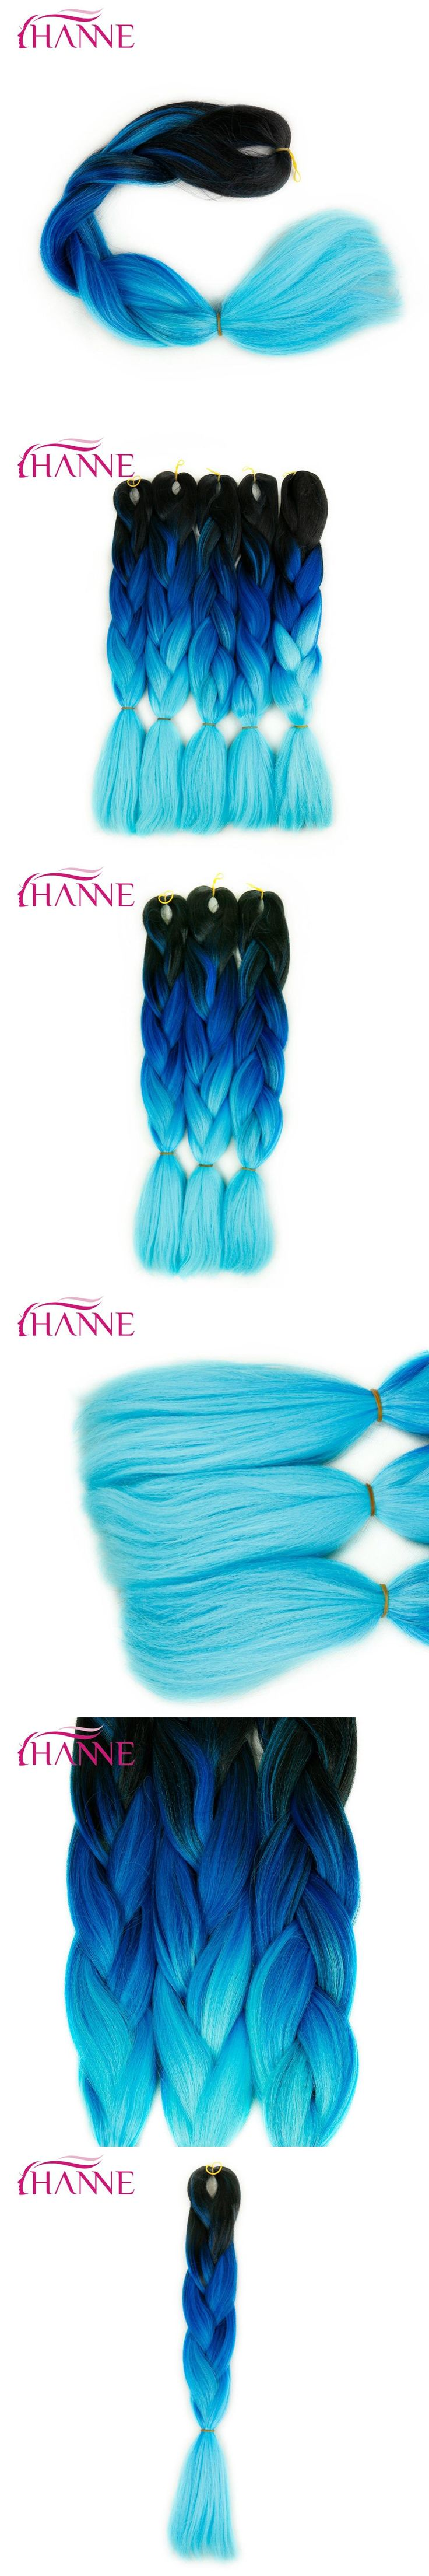 "HANNE Crochet Hair Extensions Synthetic Black To Blue Light Blue High Temperature Fiber Ombre Braiding Hair 24"" 100G Jumbo Braid"